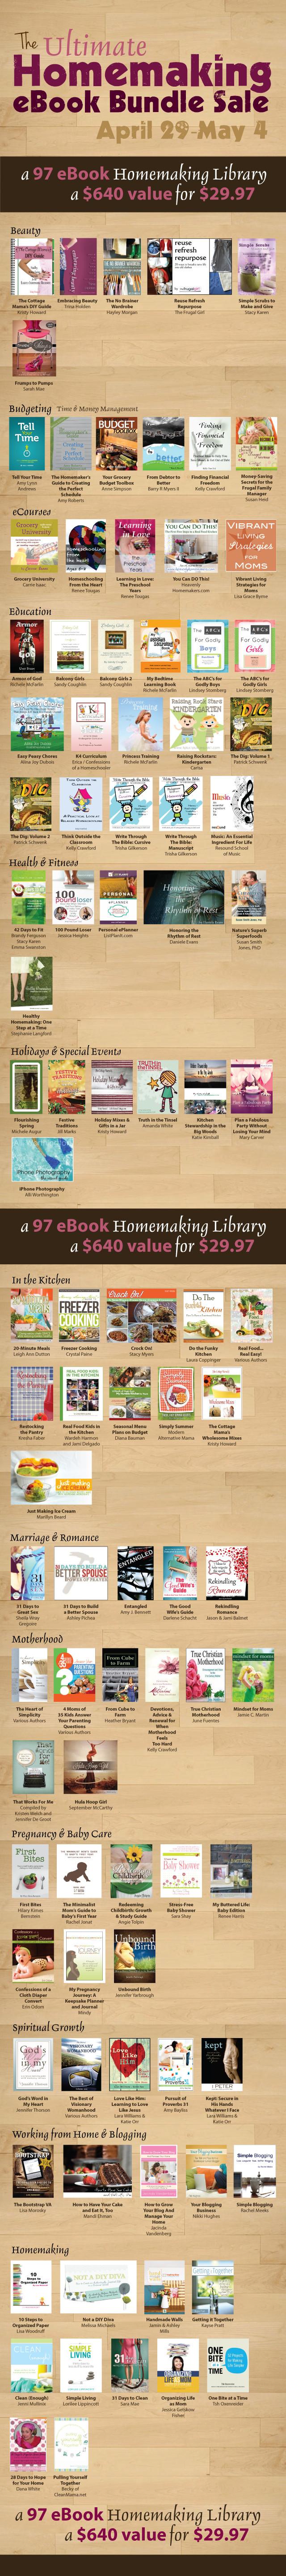 The Ultimate Homemaking Ebook Bundle Sale!